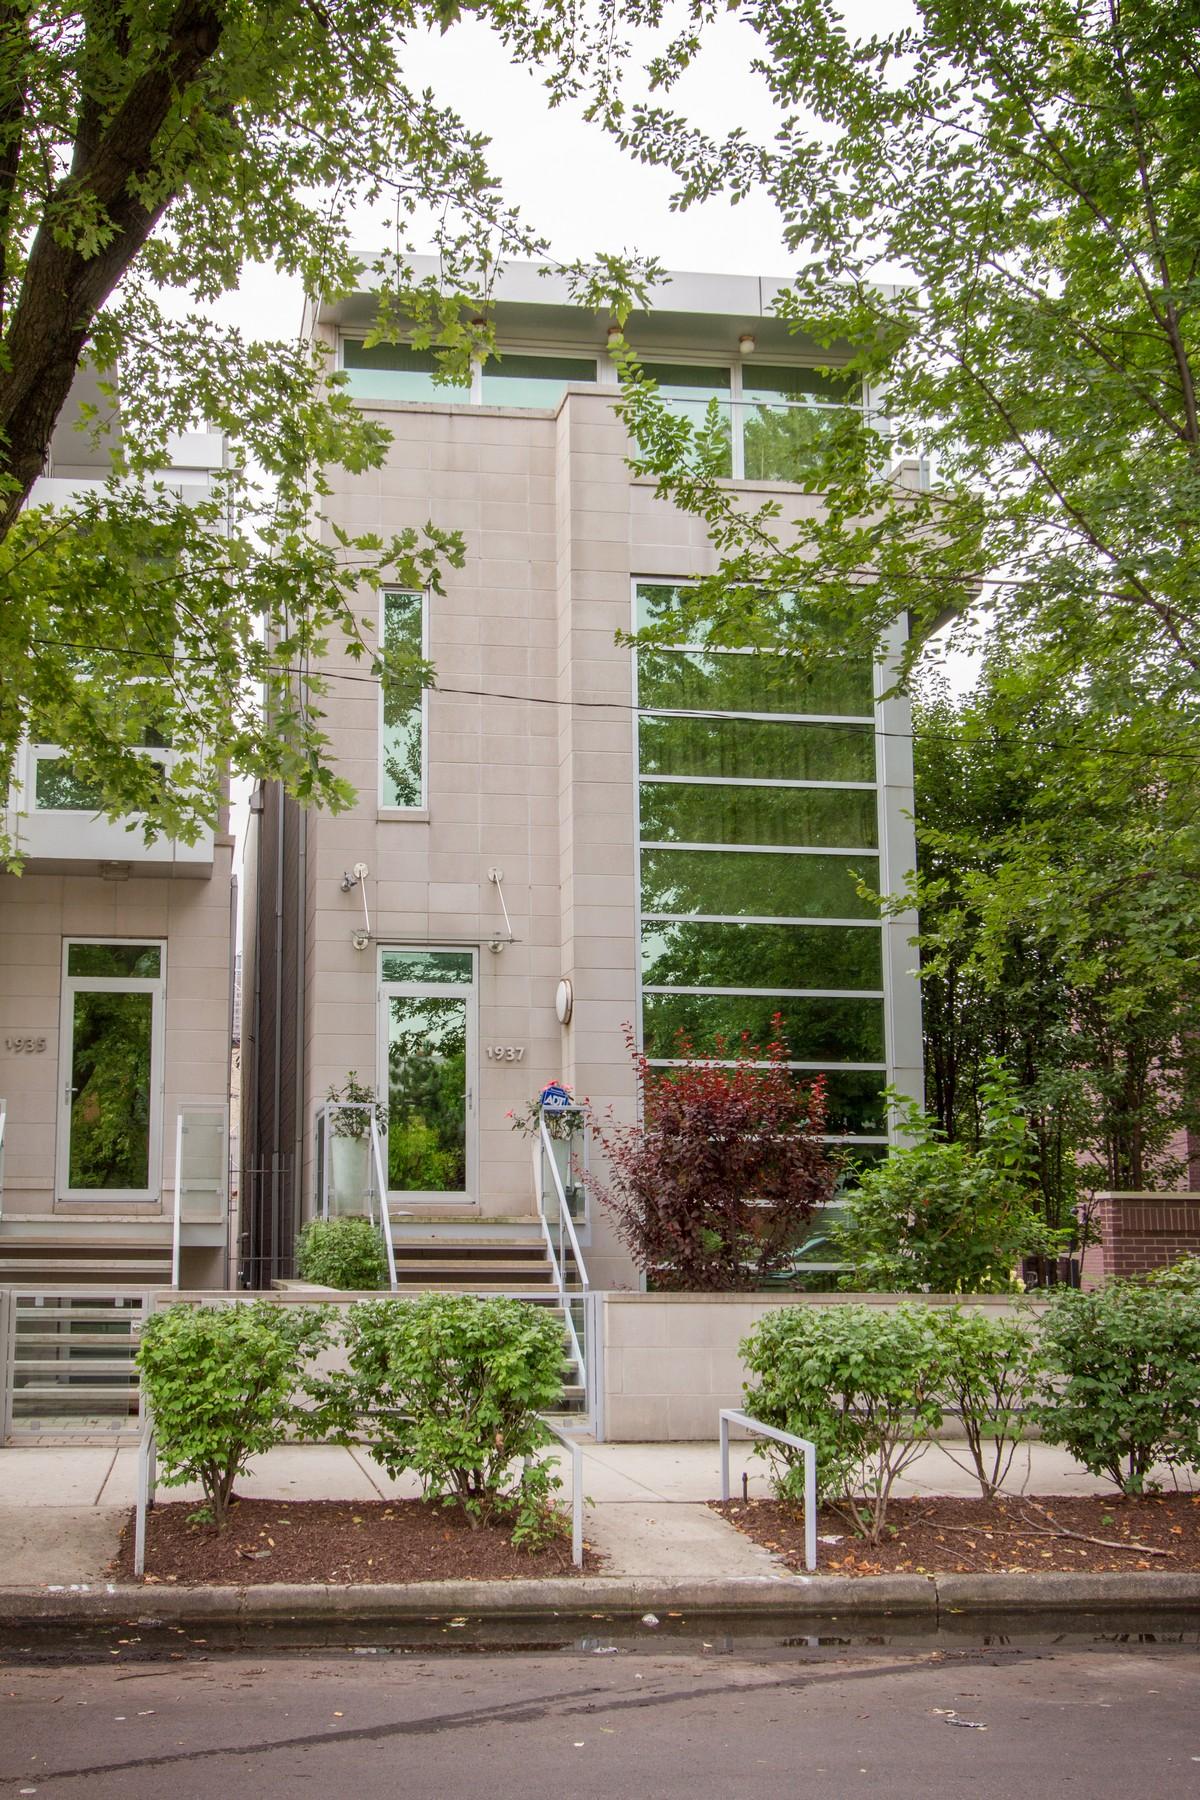 独户住宅 为 销售 在 Exceptional Newer Home 1937 W Dickens Avenue Logan Square, 芝加哥, 伊利诺斯州, 60614 美国